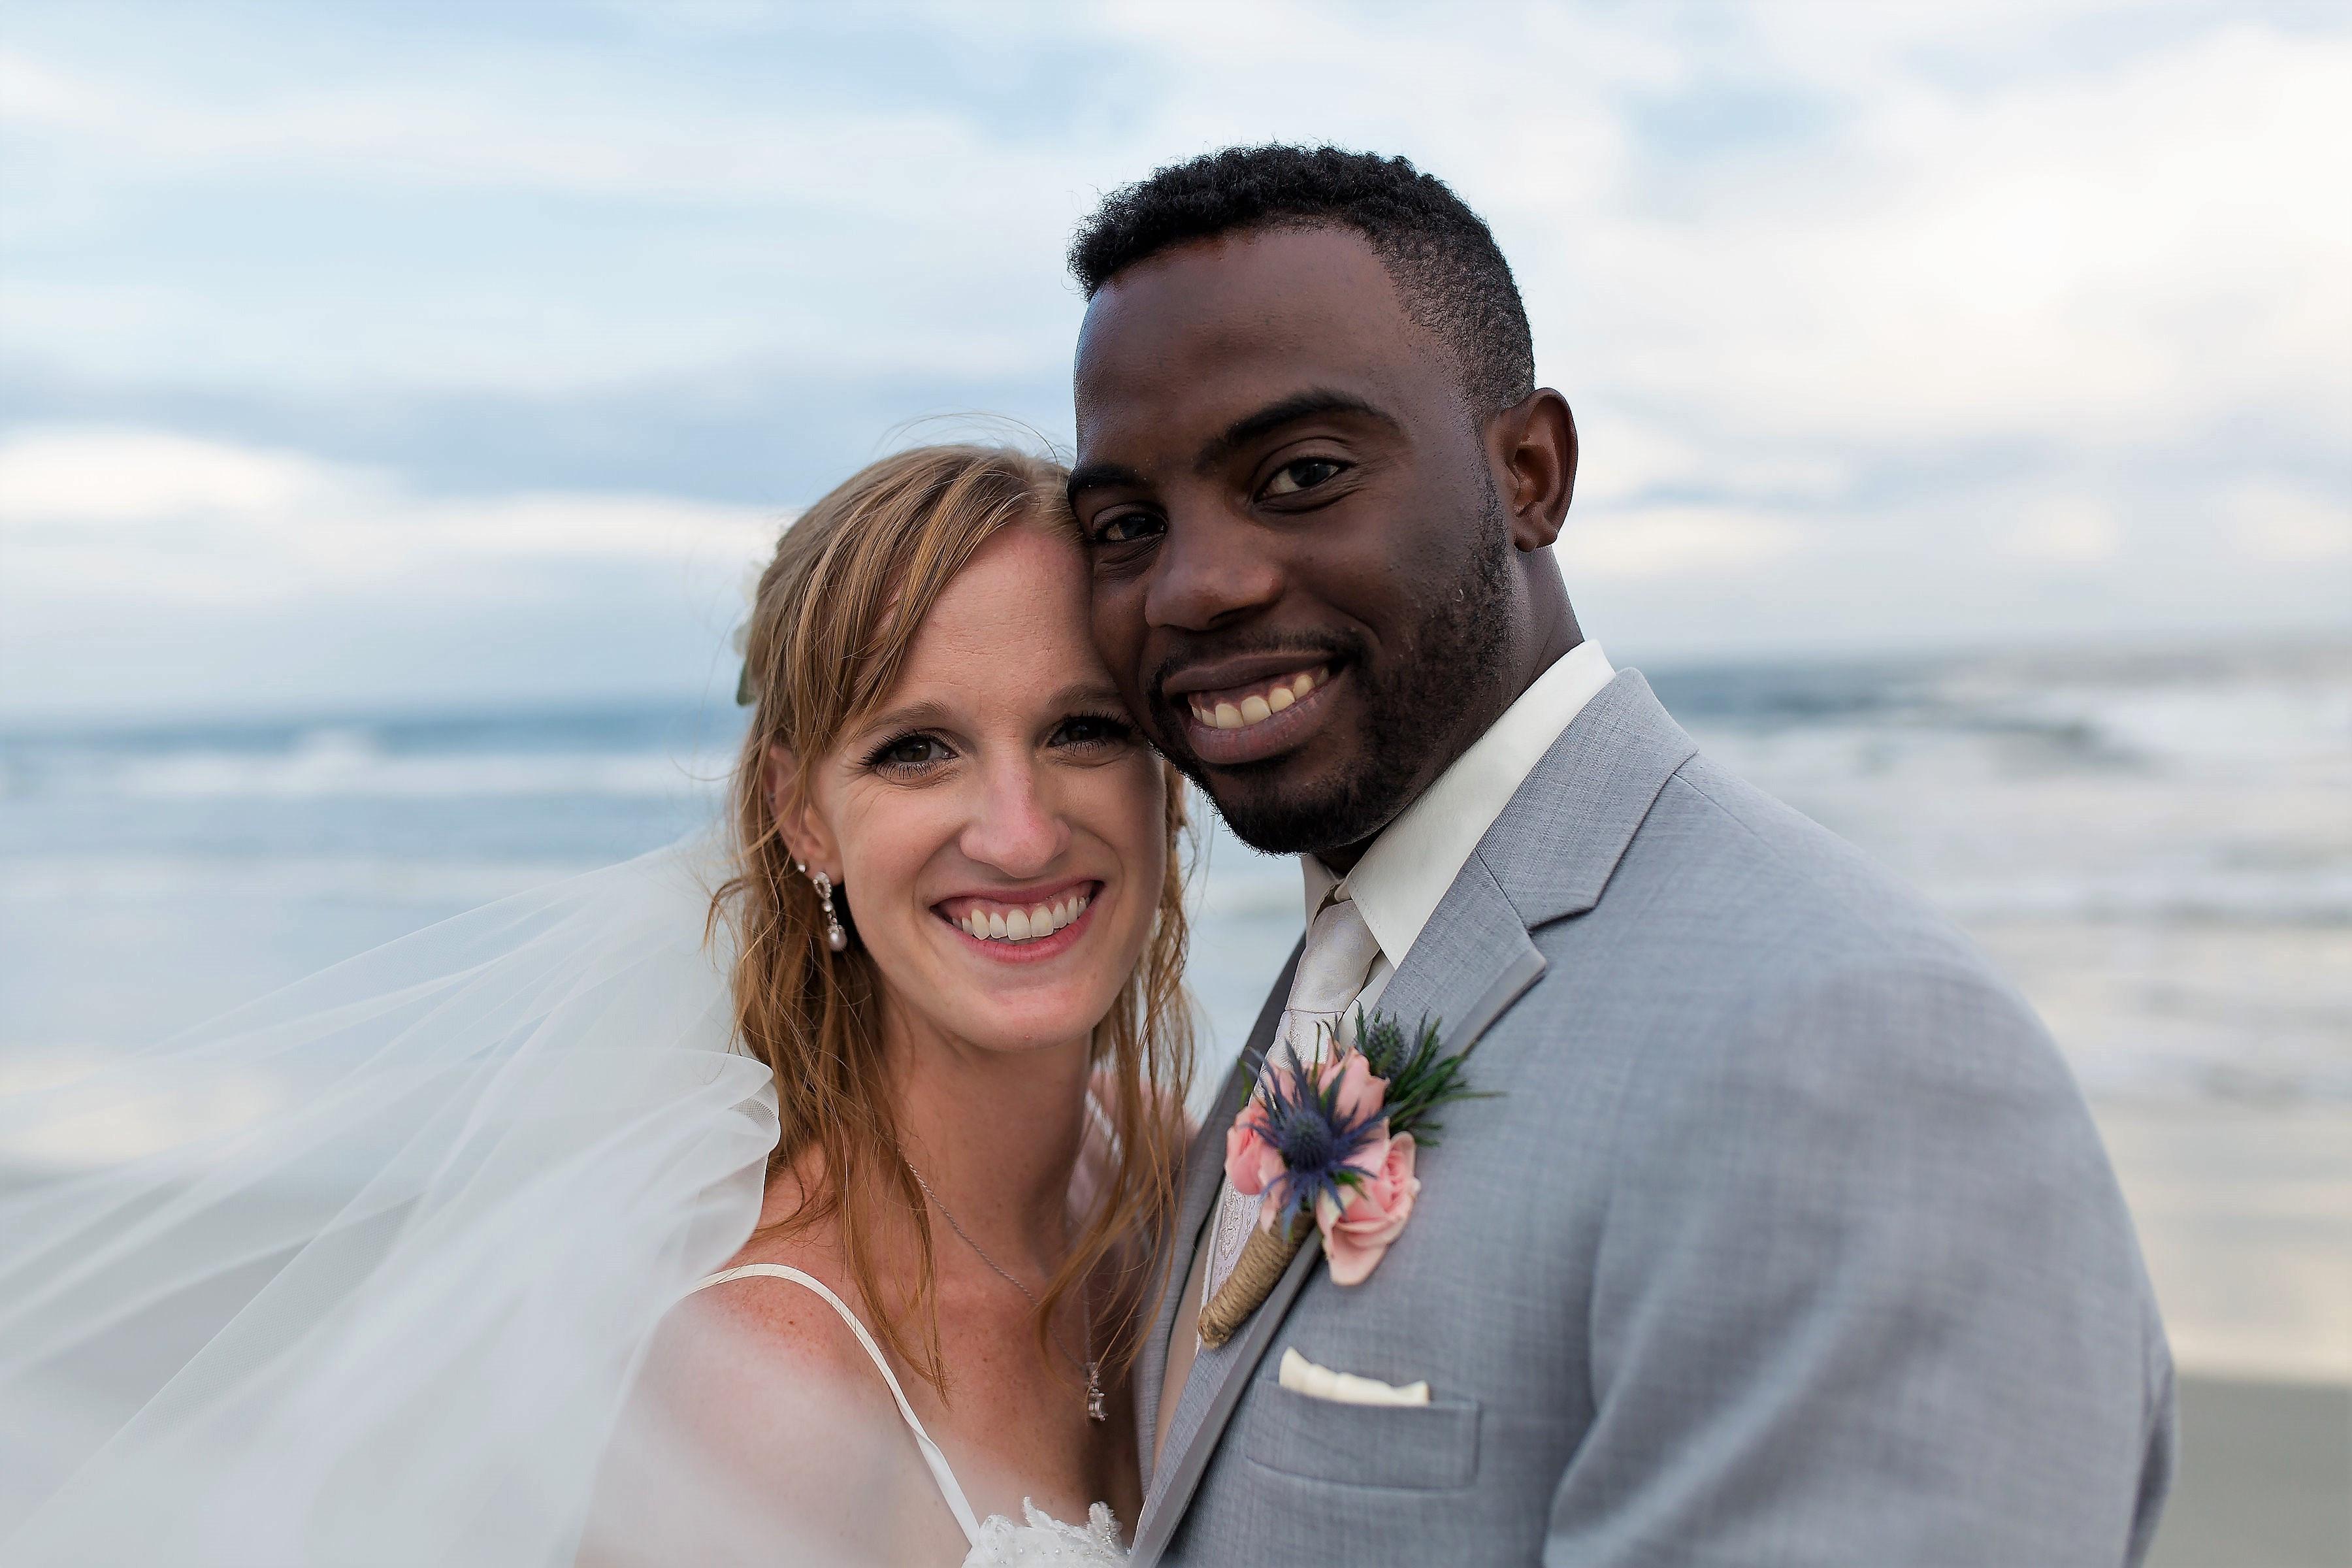 Wedding or Engagement Photos